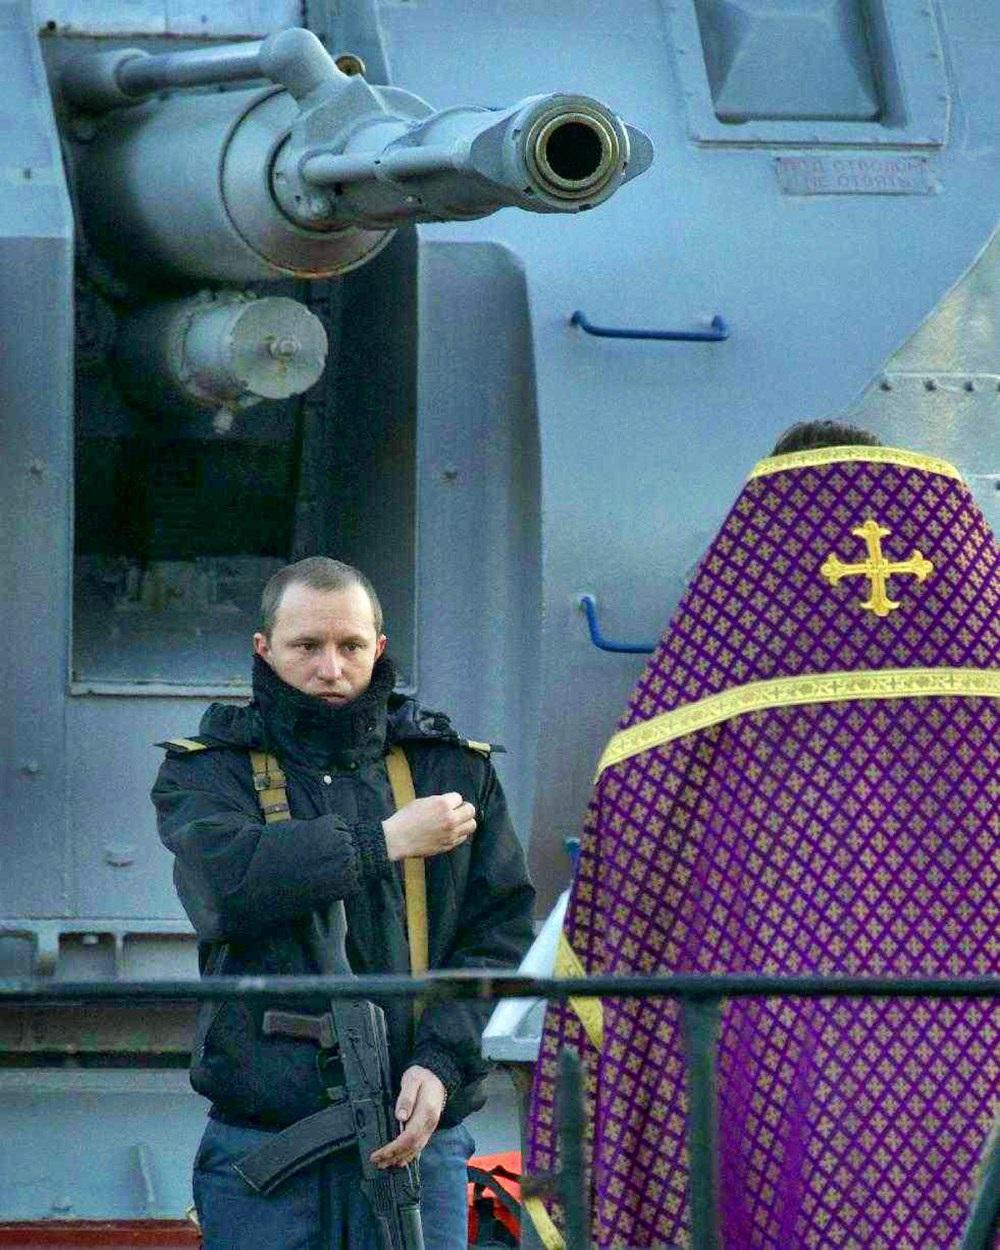 00 Crew of corvette Ternopol 01. 05.03.14